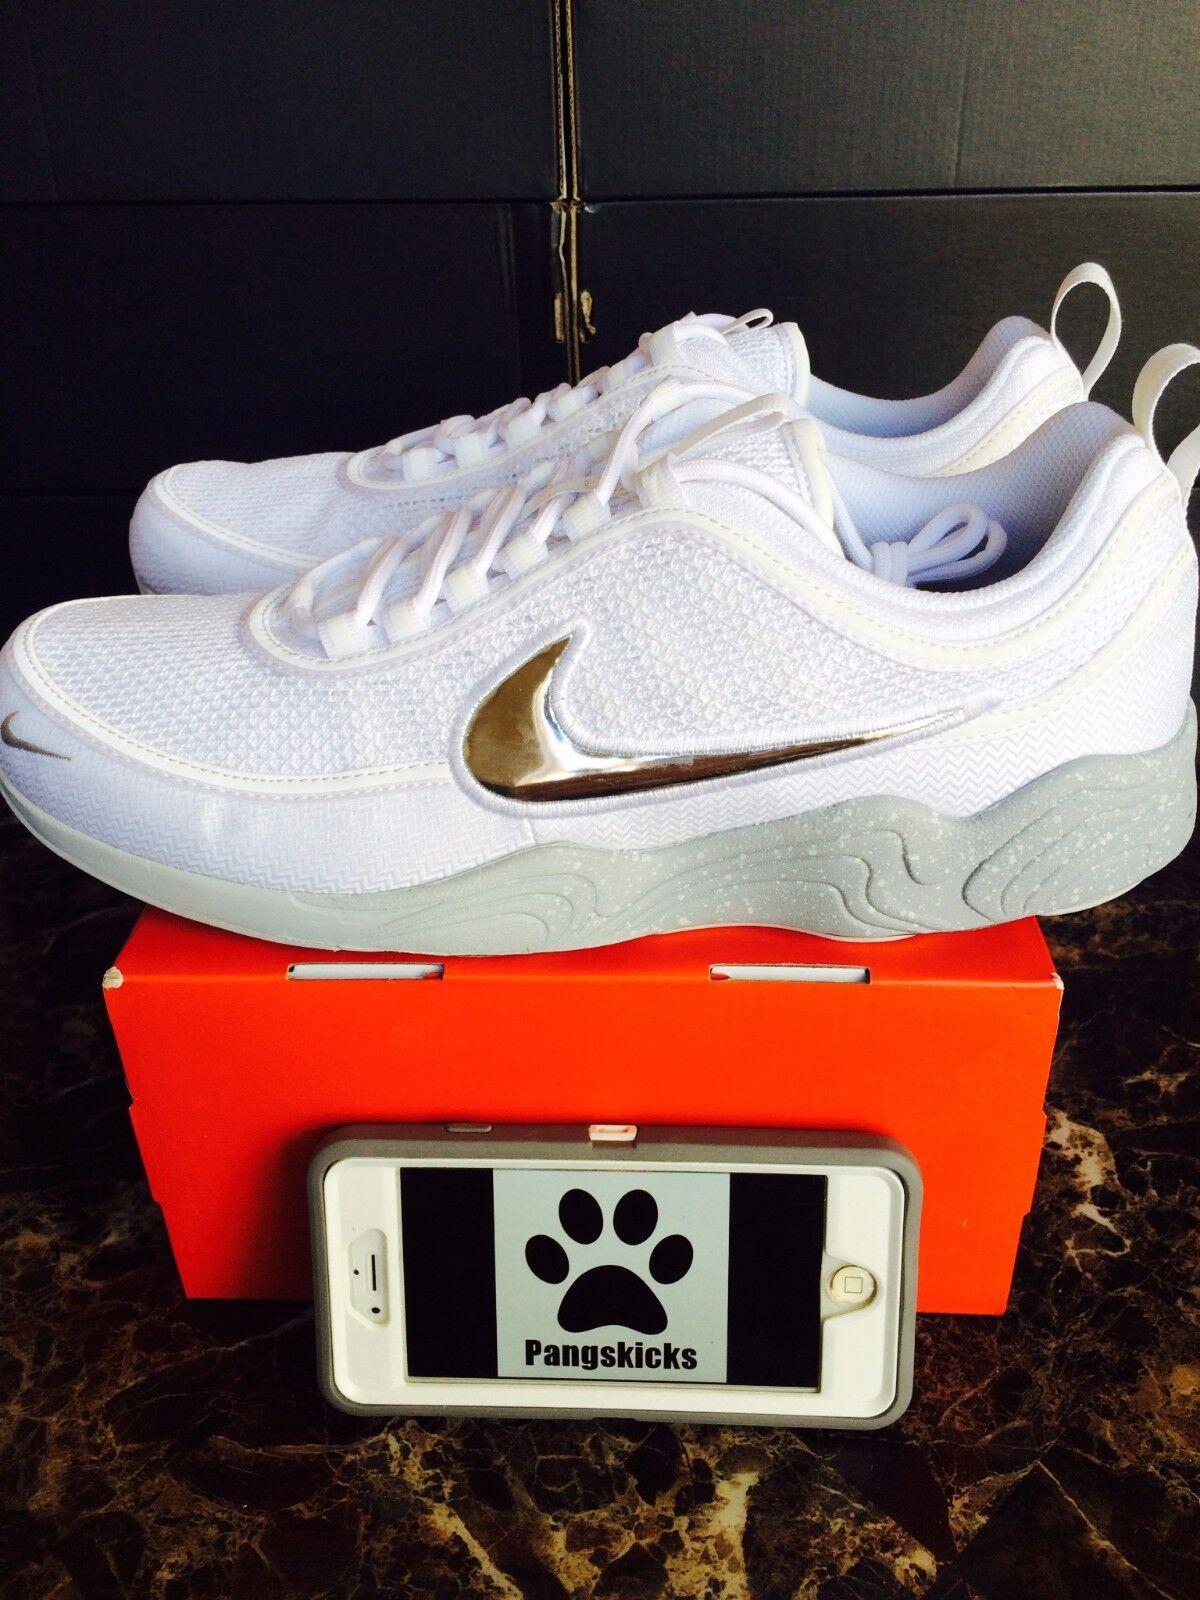 00be4cc6d248 Nike Air Zoom Spiridon  16 Olympics White Silver NikeLab 849776-100 Size 10-